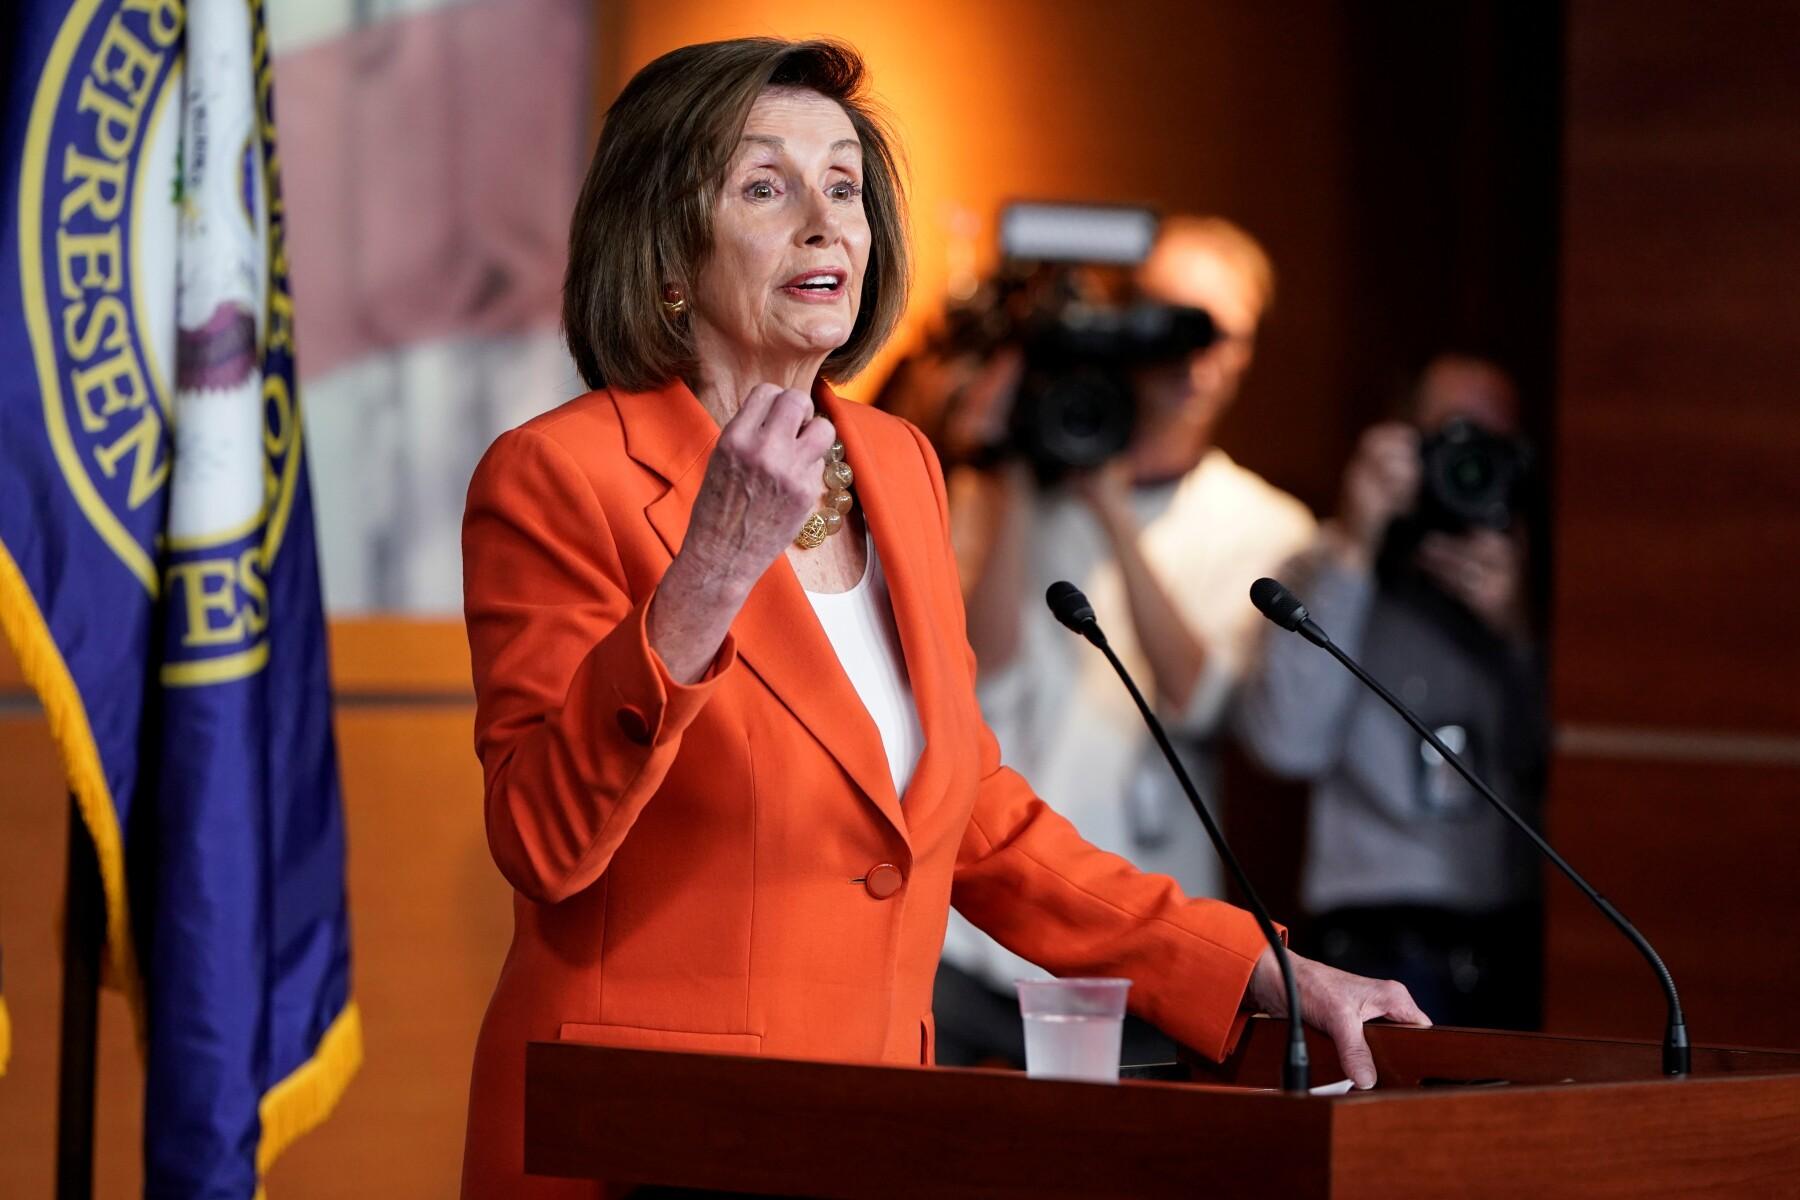 Nancy Pelosi T-MEC ratificación